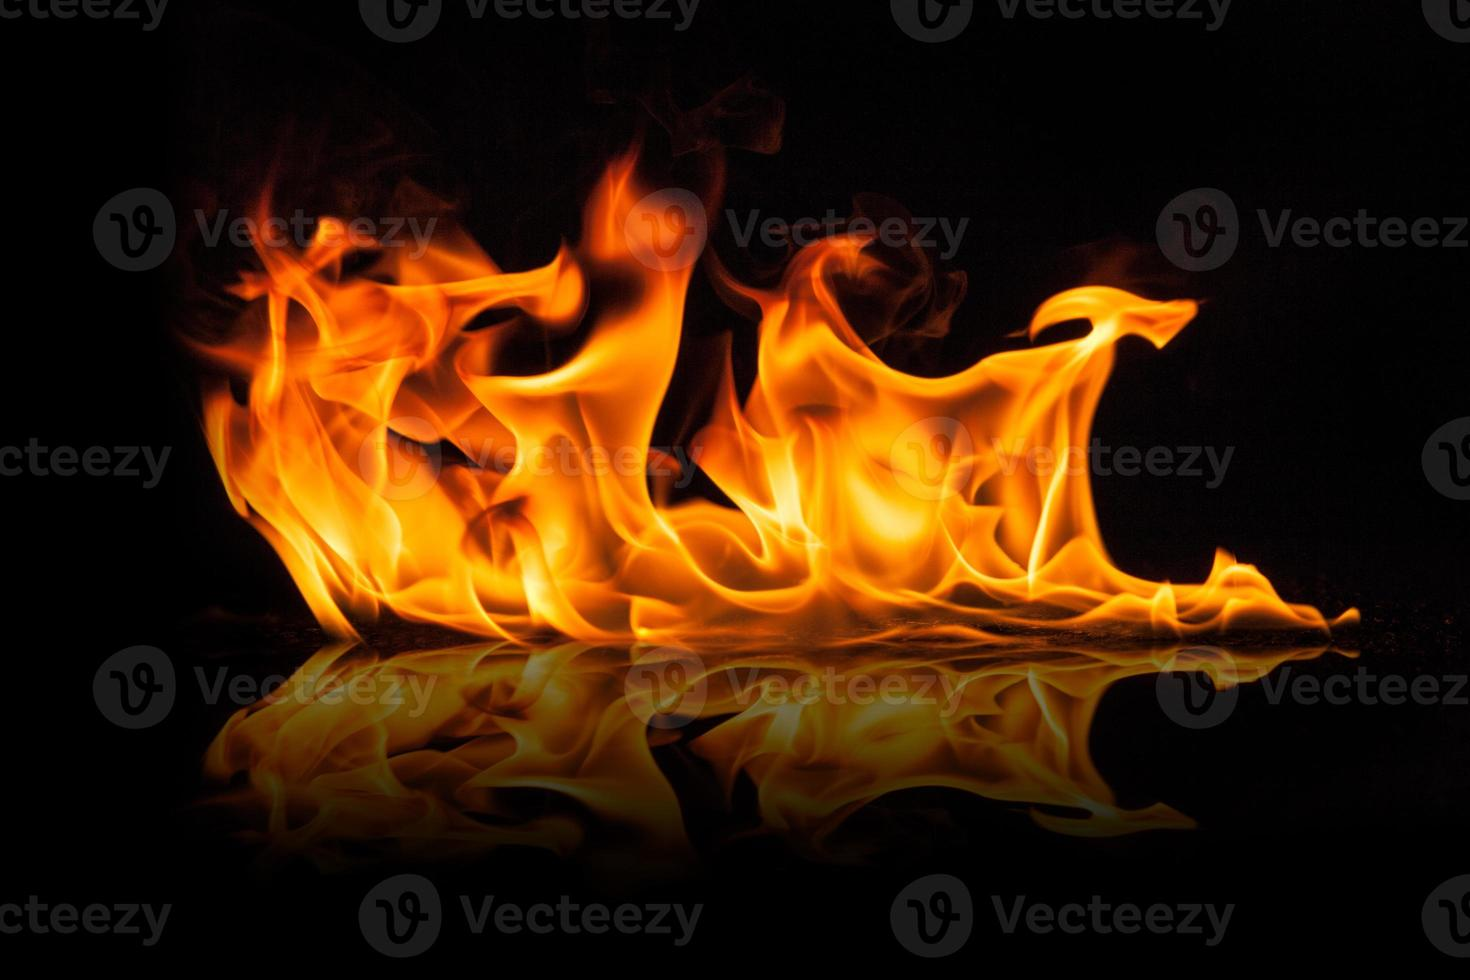 mooie stijlvolle vuurvlammen foto